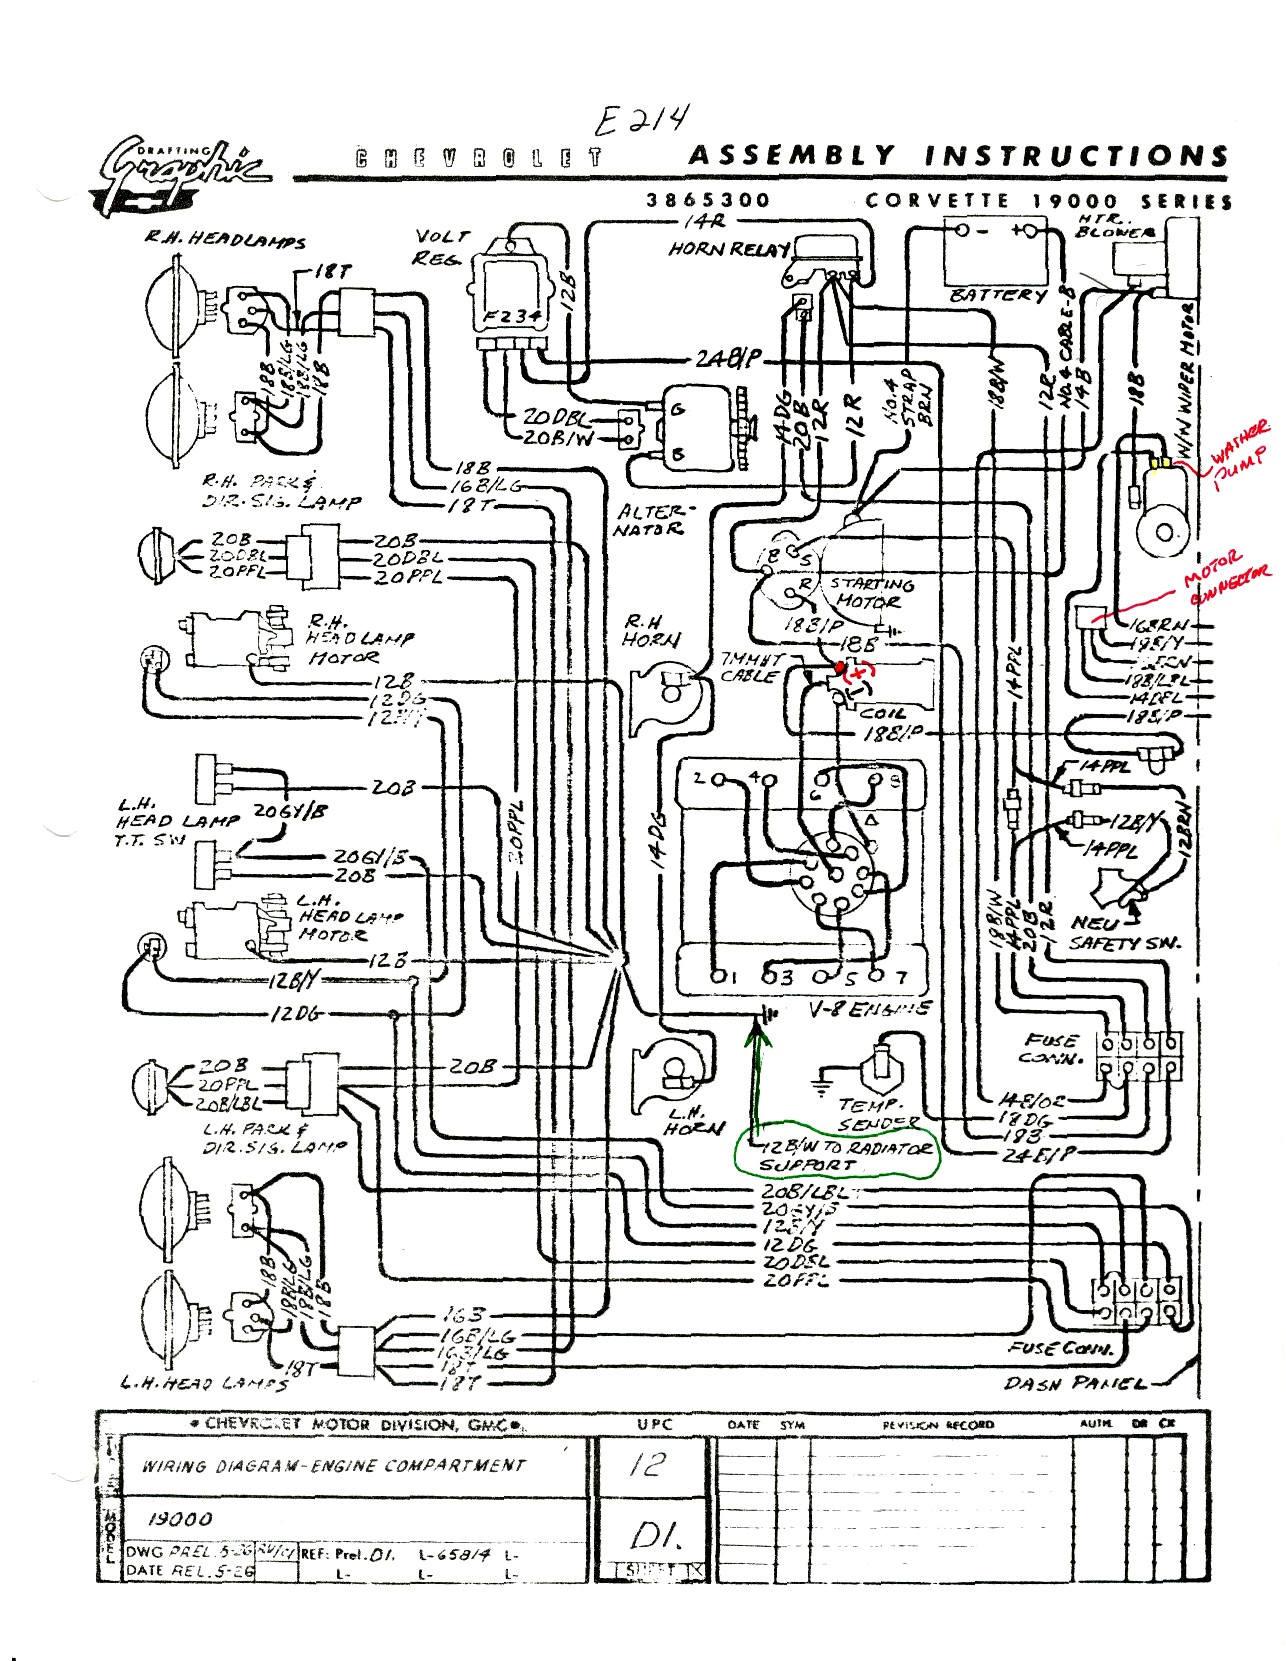 1984 chevy truck headlight wiring diagram trailer brake 7 way i need a 1965 - corvetteforum chevrolet corvette forum discussion